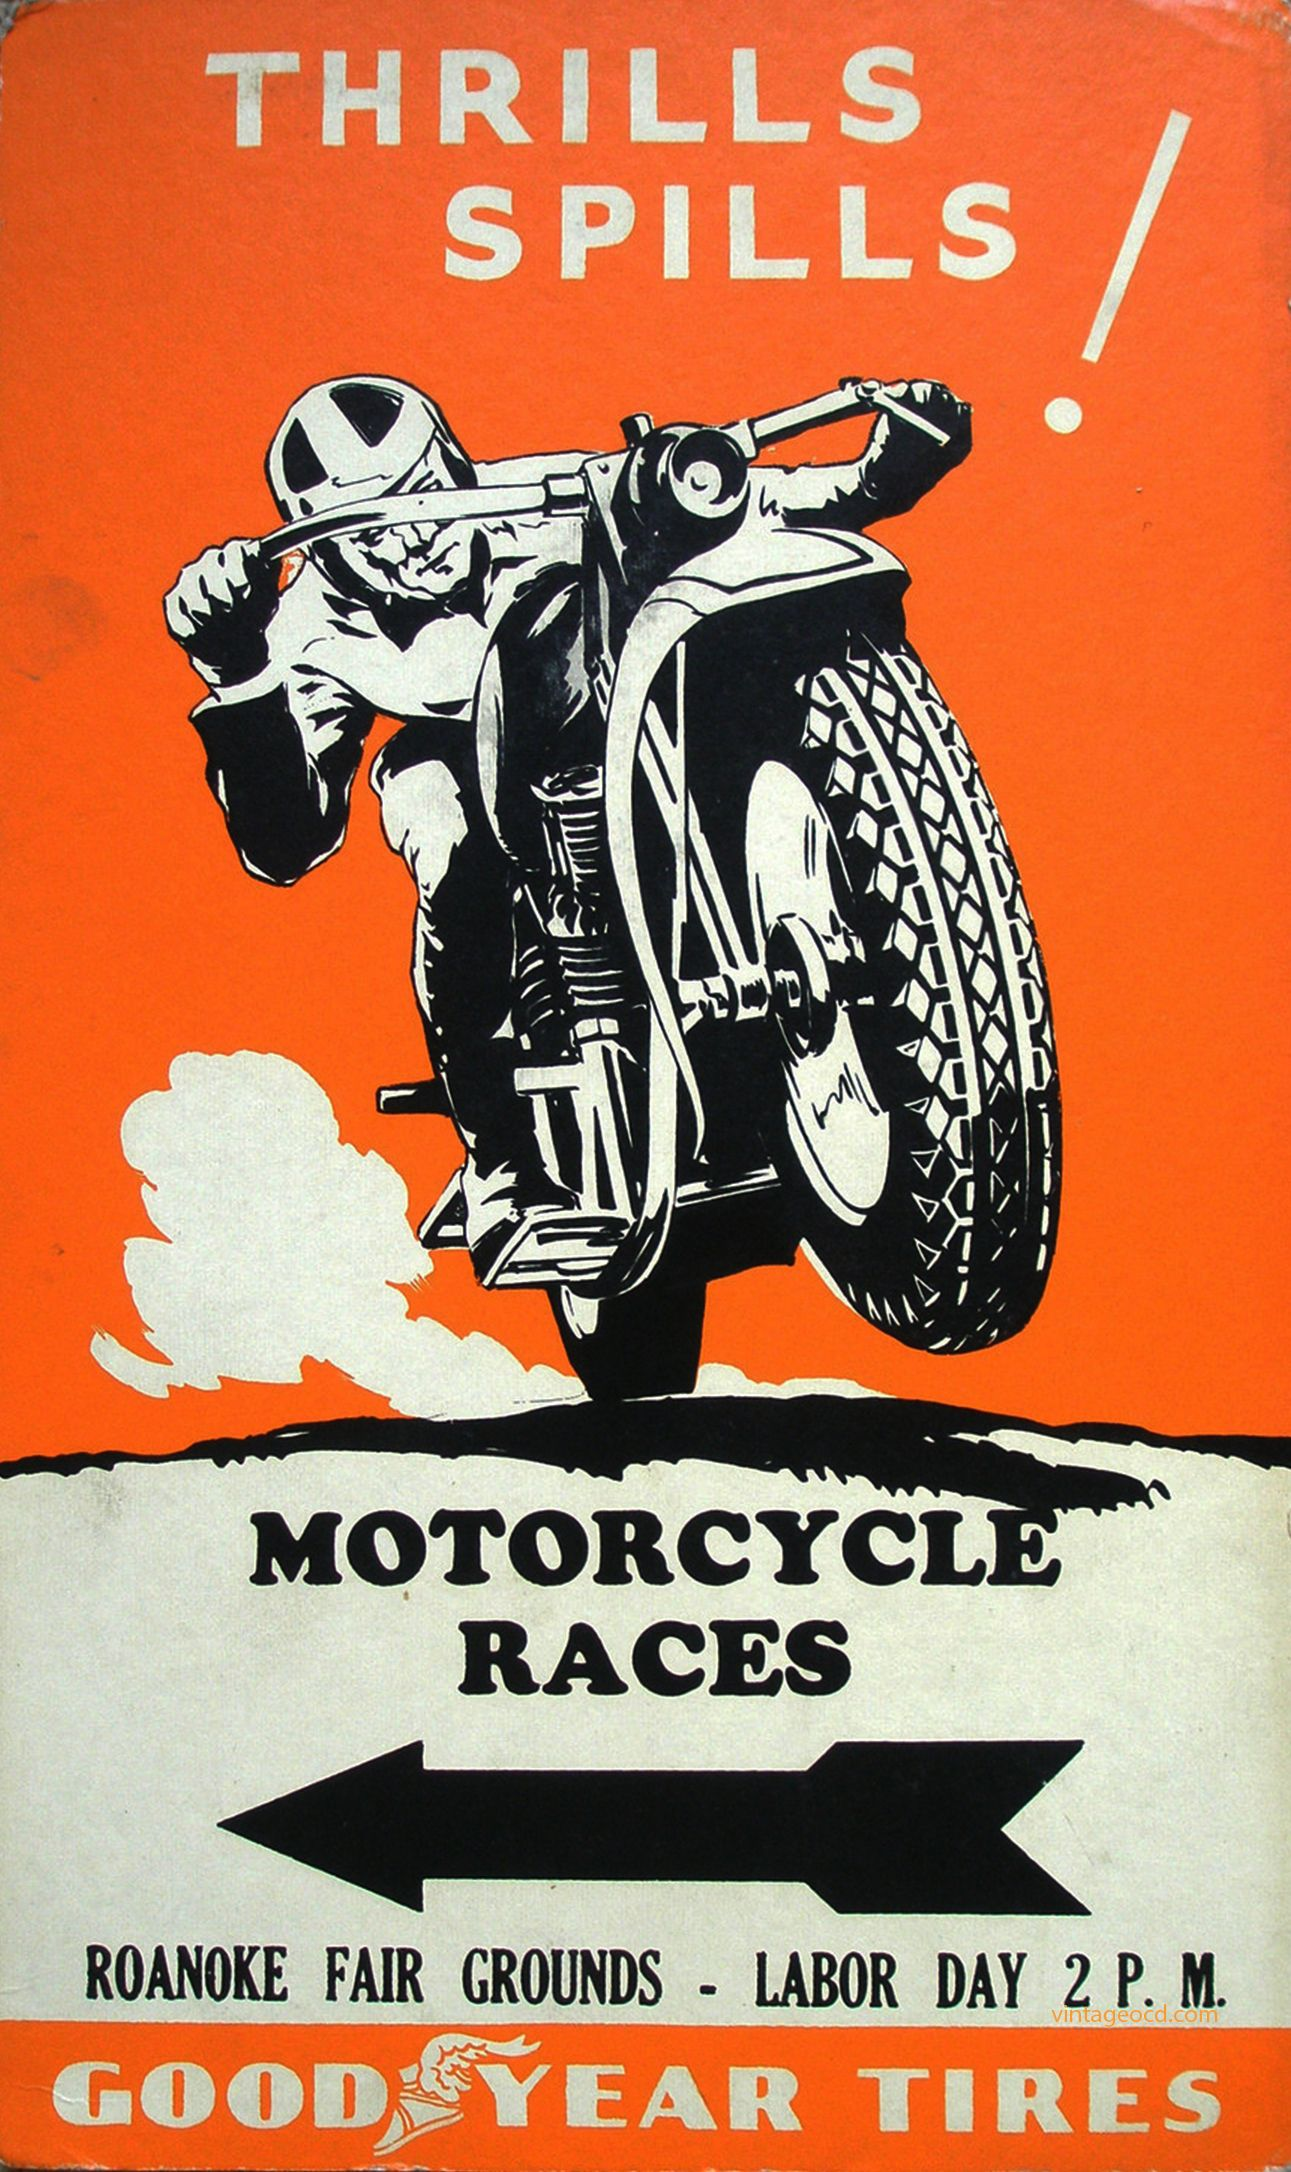 Vintageocd Thrills Spills Motorcycle Poster Jpg 1 291 2 172 Pixels Vintage Motorcycle Posters Motorcycle Posters Racing Motorcycles